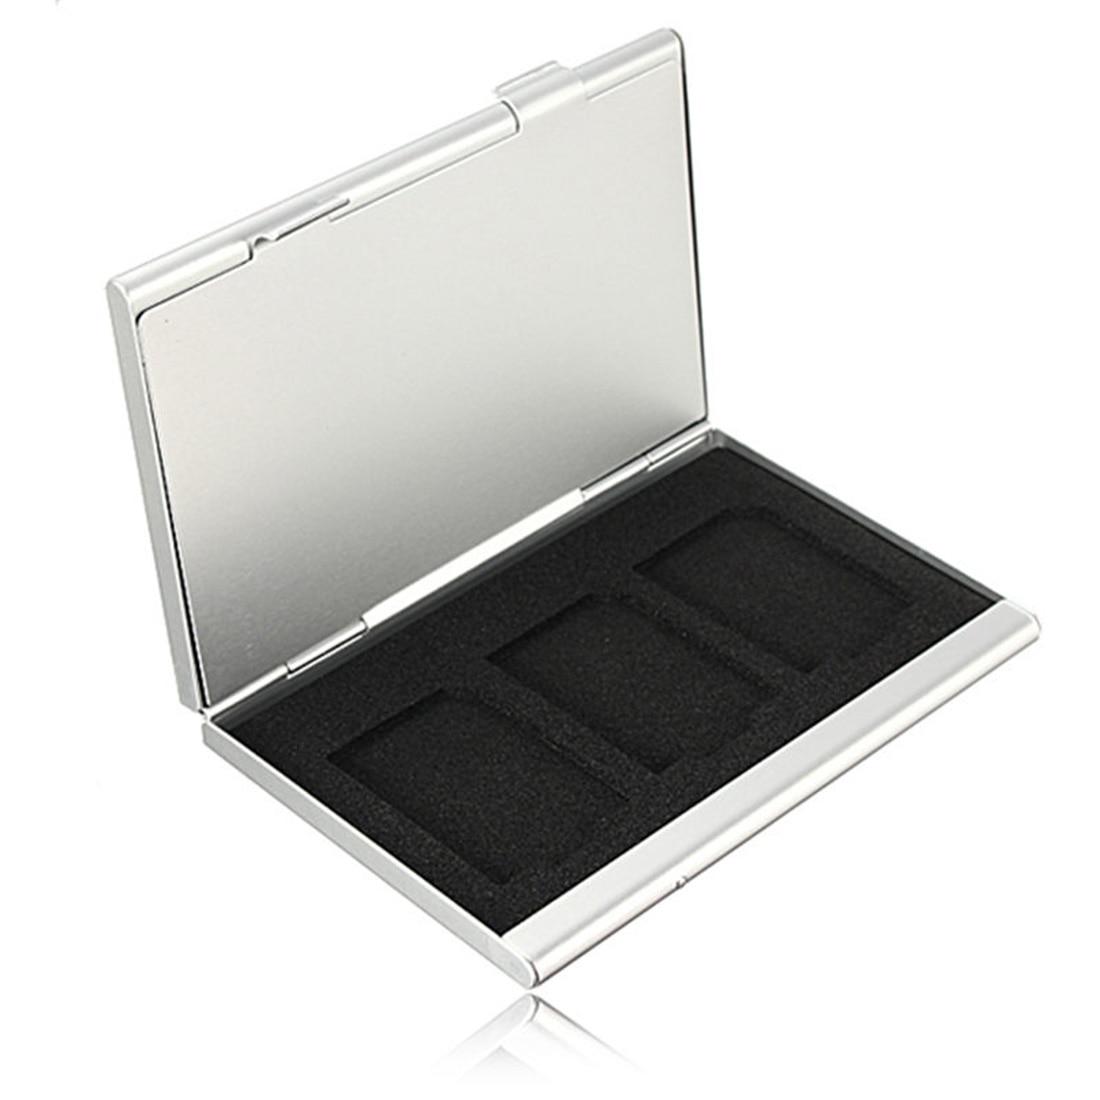 Centechia Top Quality 6 Slots Dougle-desk Aluminum Storage Box For SD SDHC SDXC MMC Memory Card Case Holder Protector